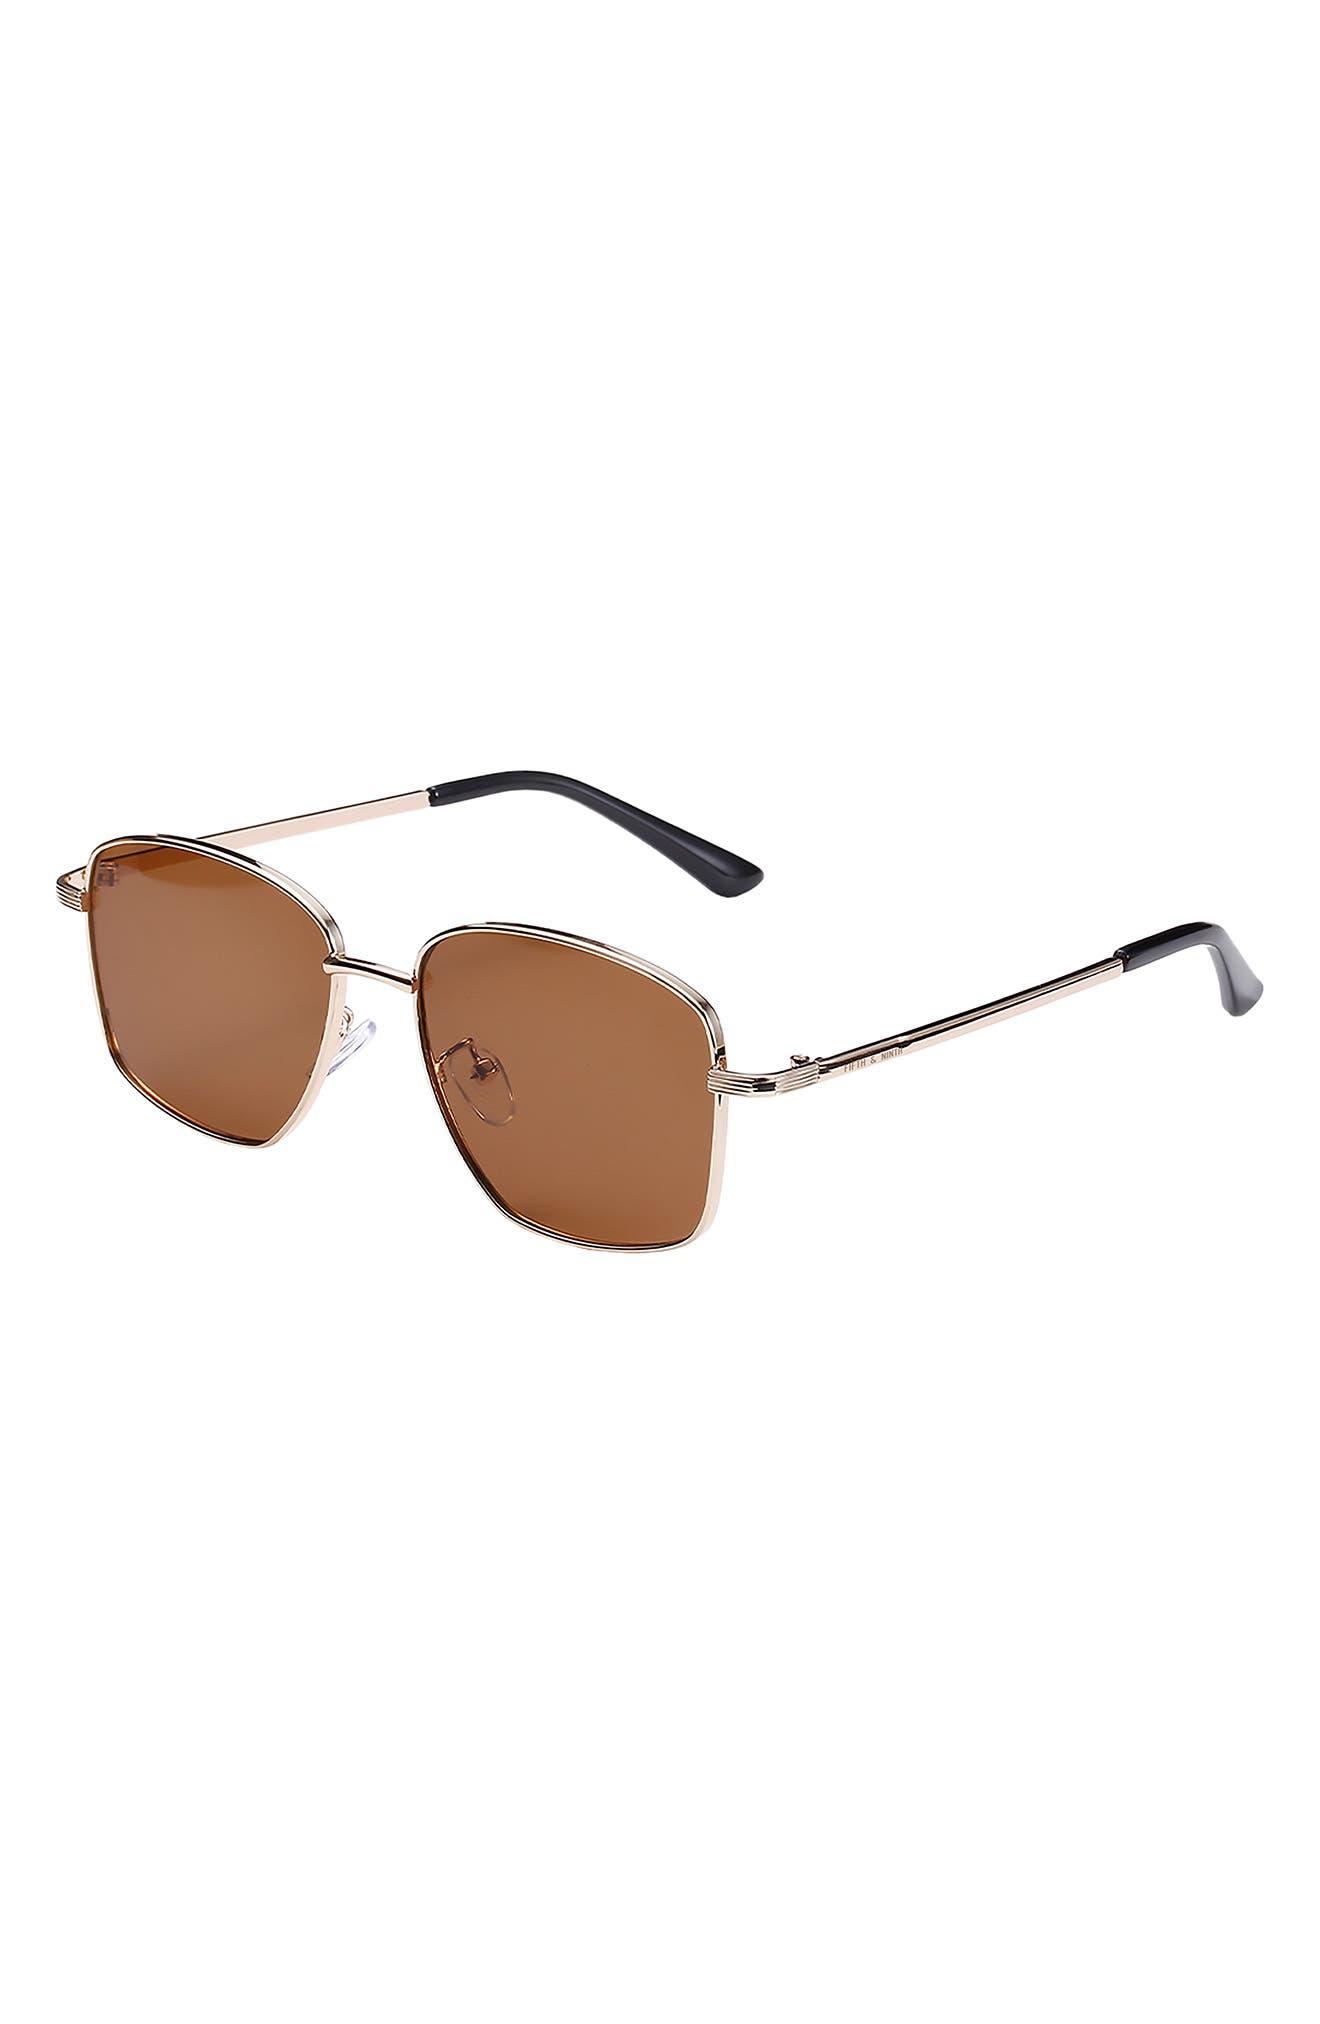 Monterey 56mm Square Sunglasses